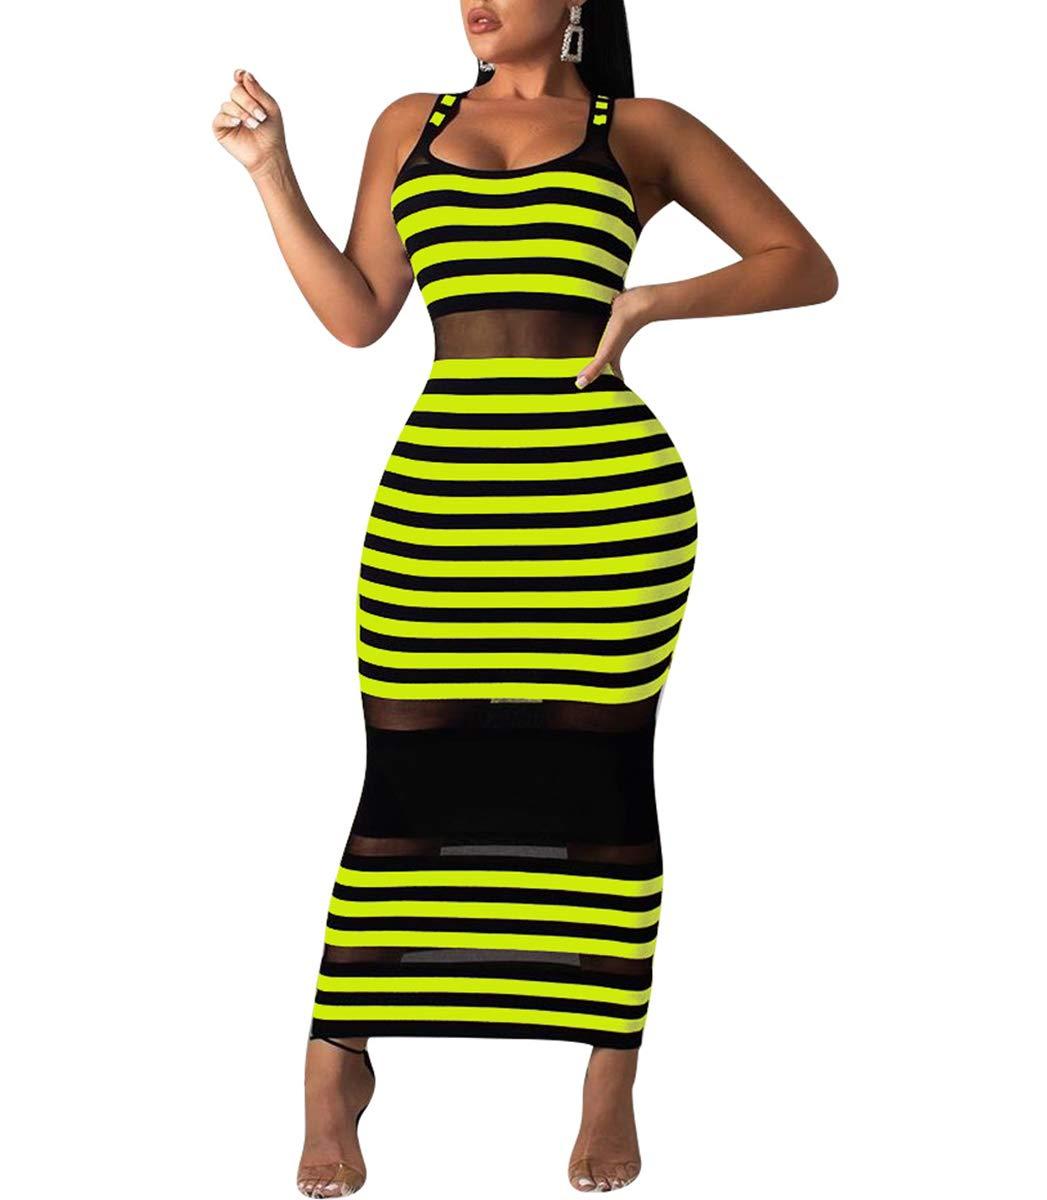 Available at Amazon: Ophestin Women's Sexy Bodycon Outfit - Sleeveless Stripe Print Summer Tanks Sheer Mesh Summer Beach Long Maxi Dress